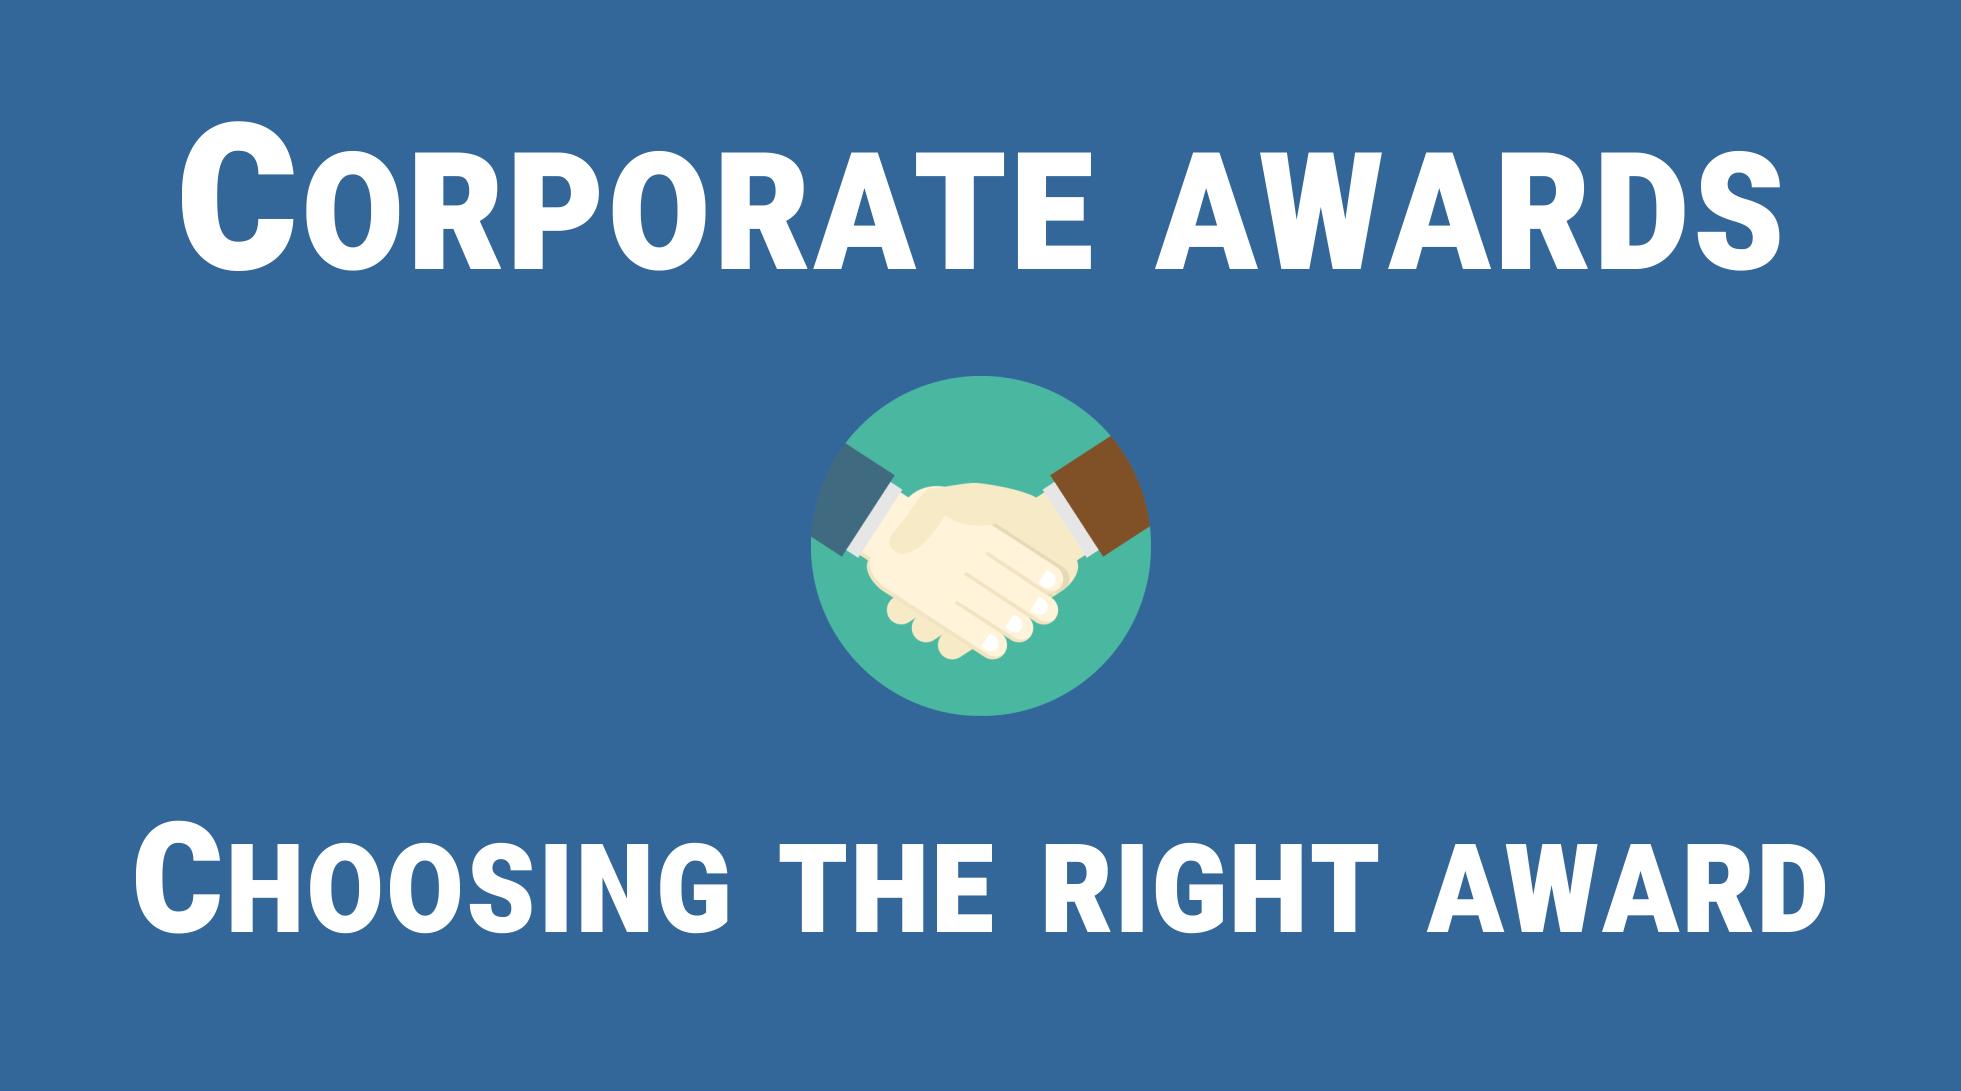 Corporate awards - choosing the right award